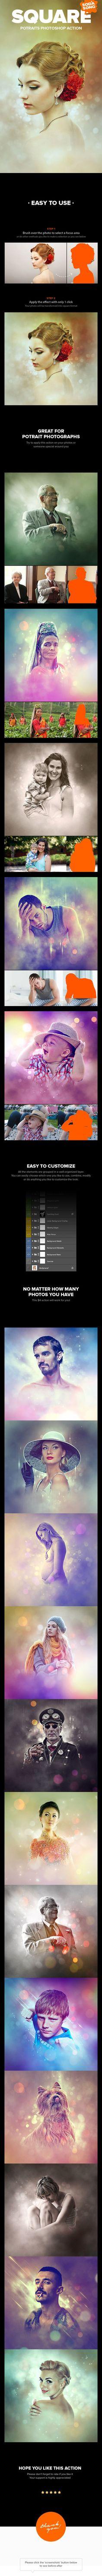 Square Potraits Photoshop Action - Photo Effects Actions